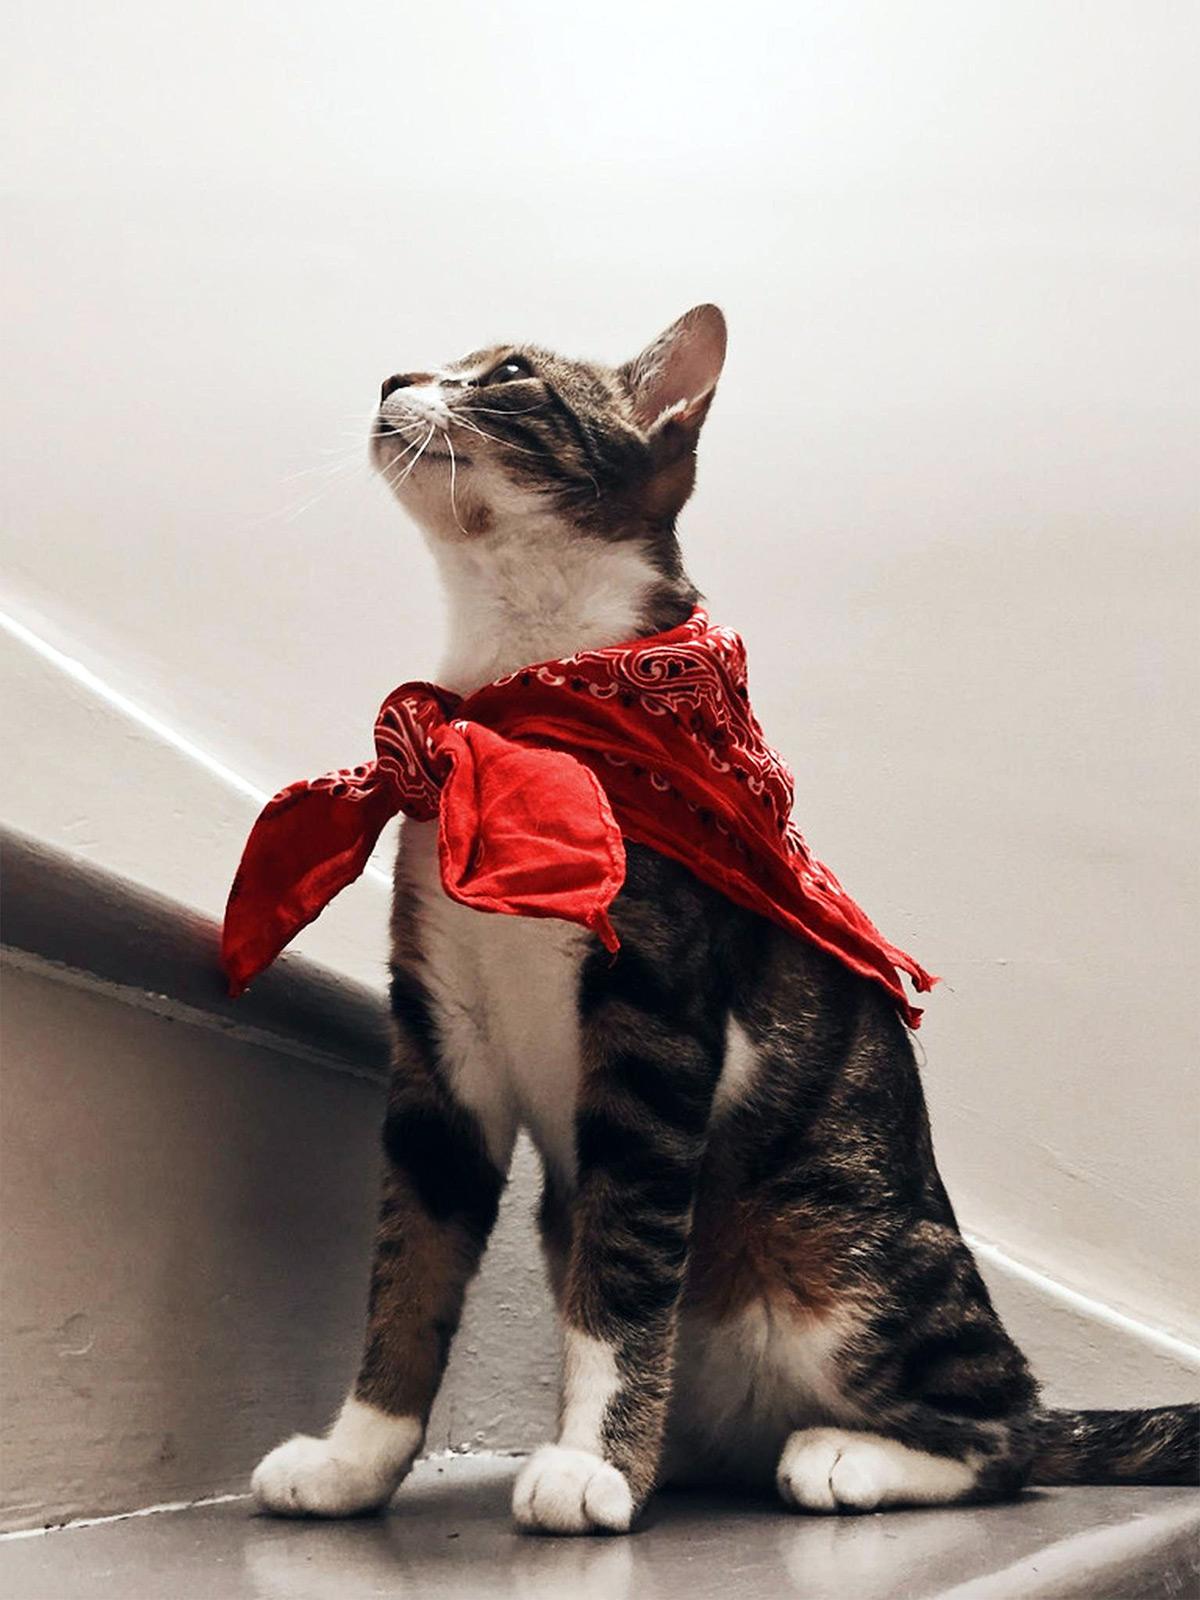 Cat wearing red bandana